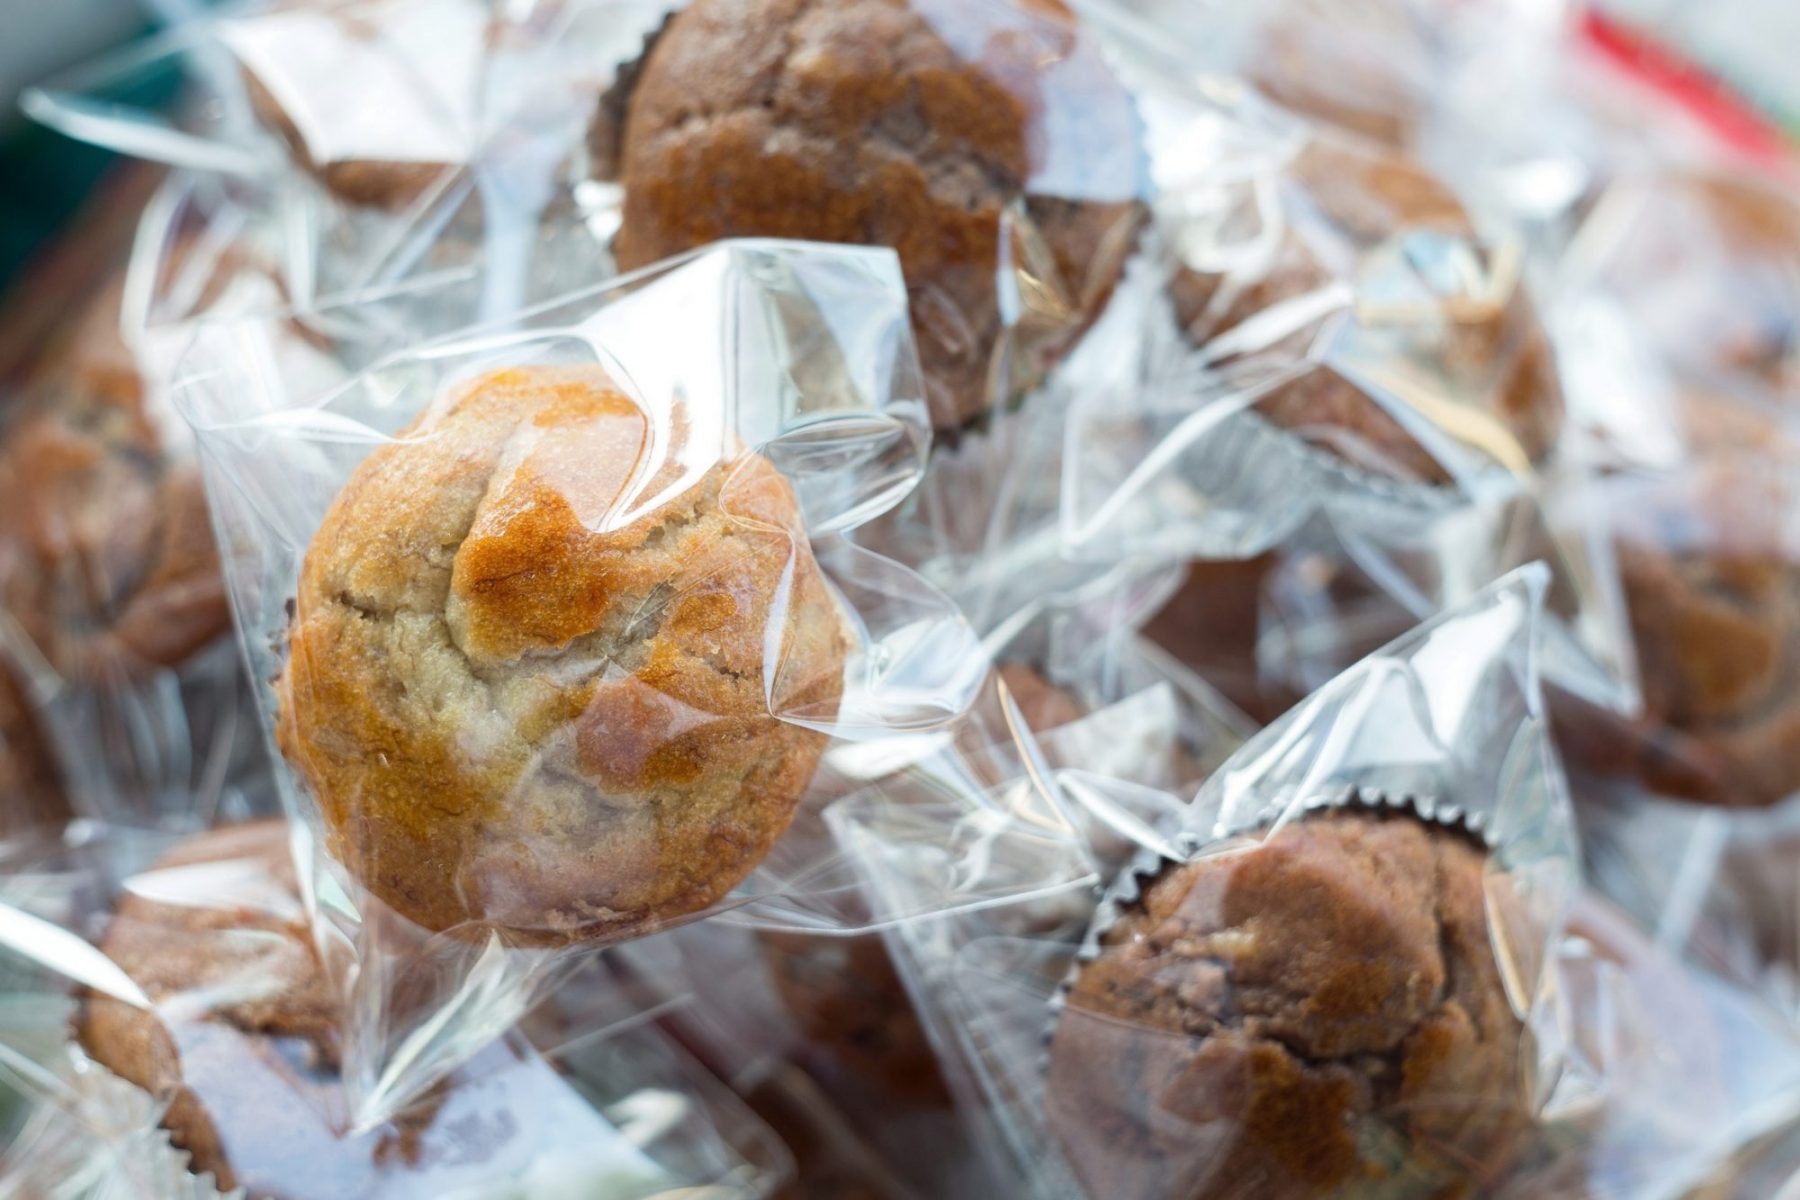 Nashville Grab-and-Go Snacks | Break Room | Healthy Vending | Workplace Culture